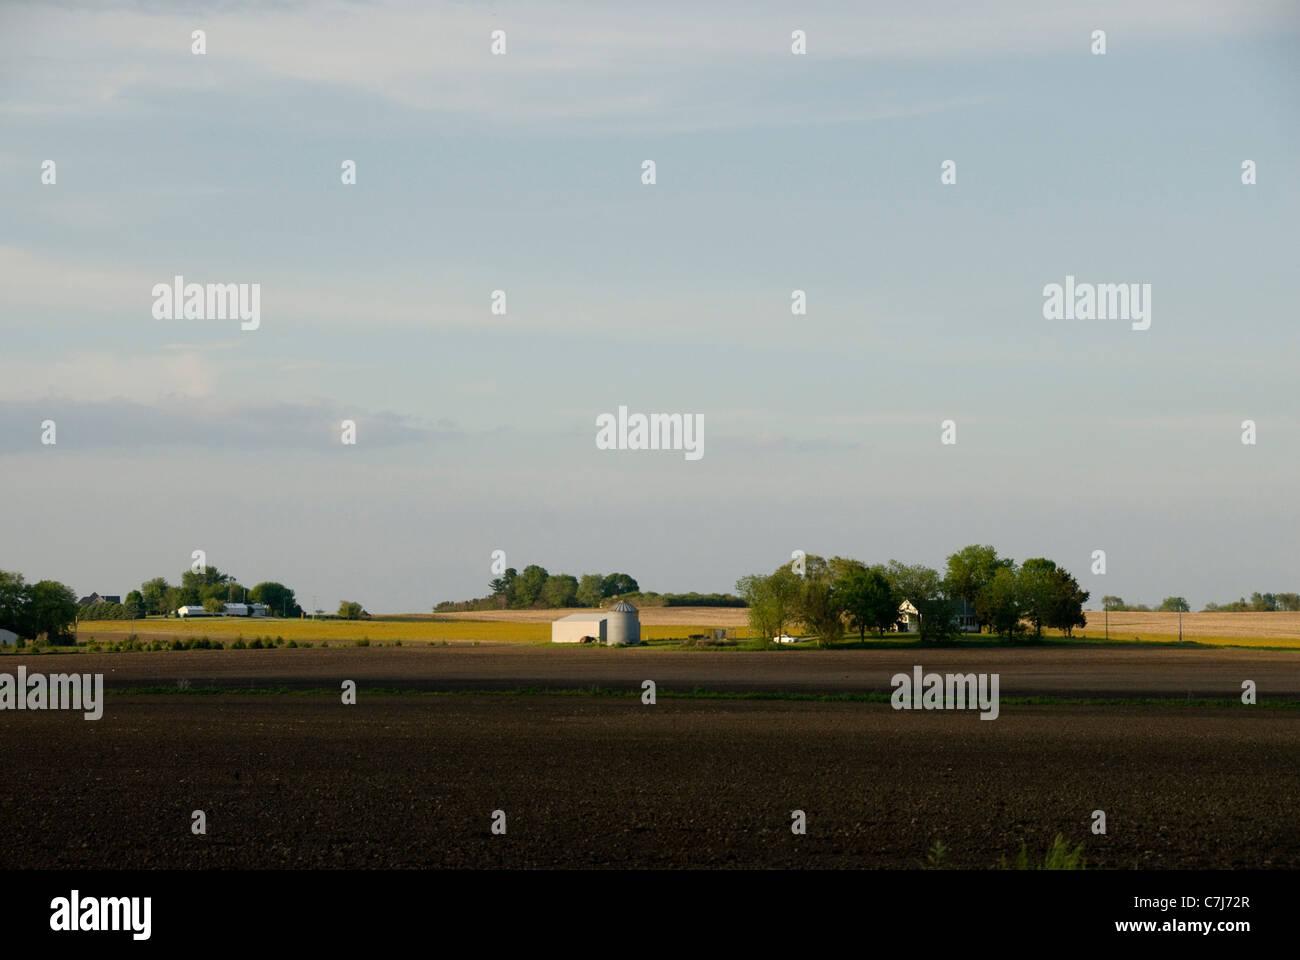 farm buildings and prairie, near Champaign Urbana, Illinois, USA - Stock Image